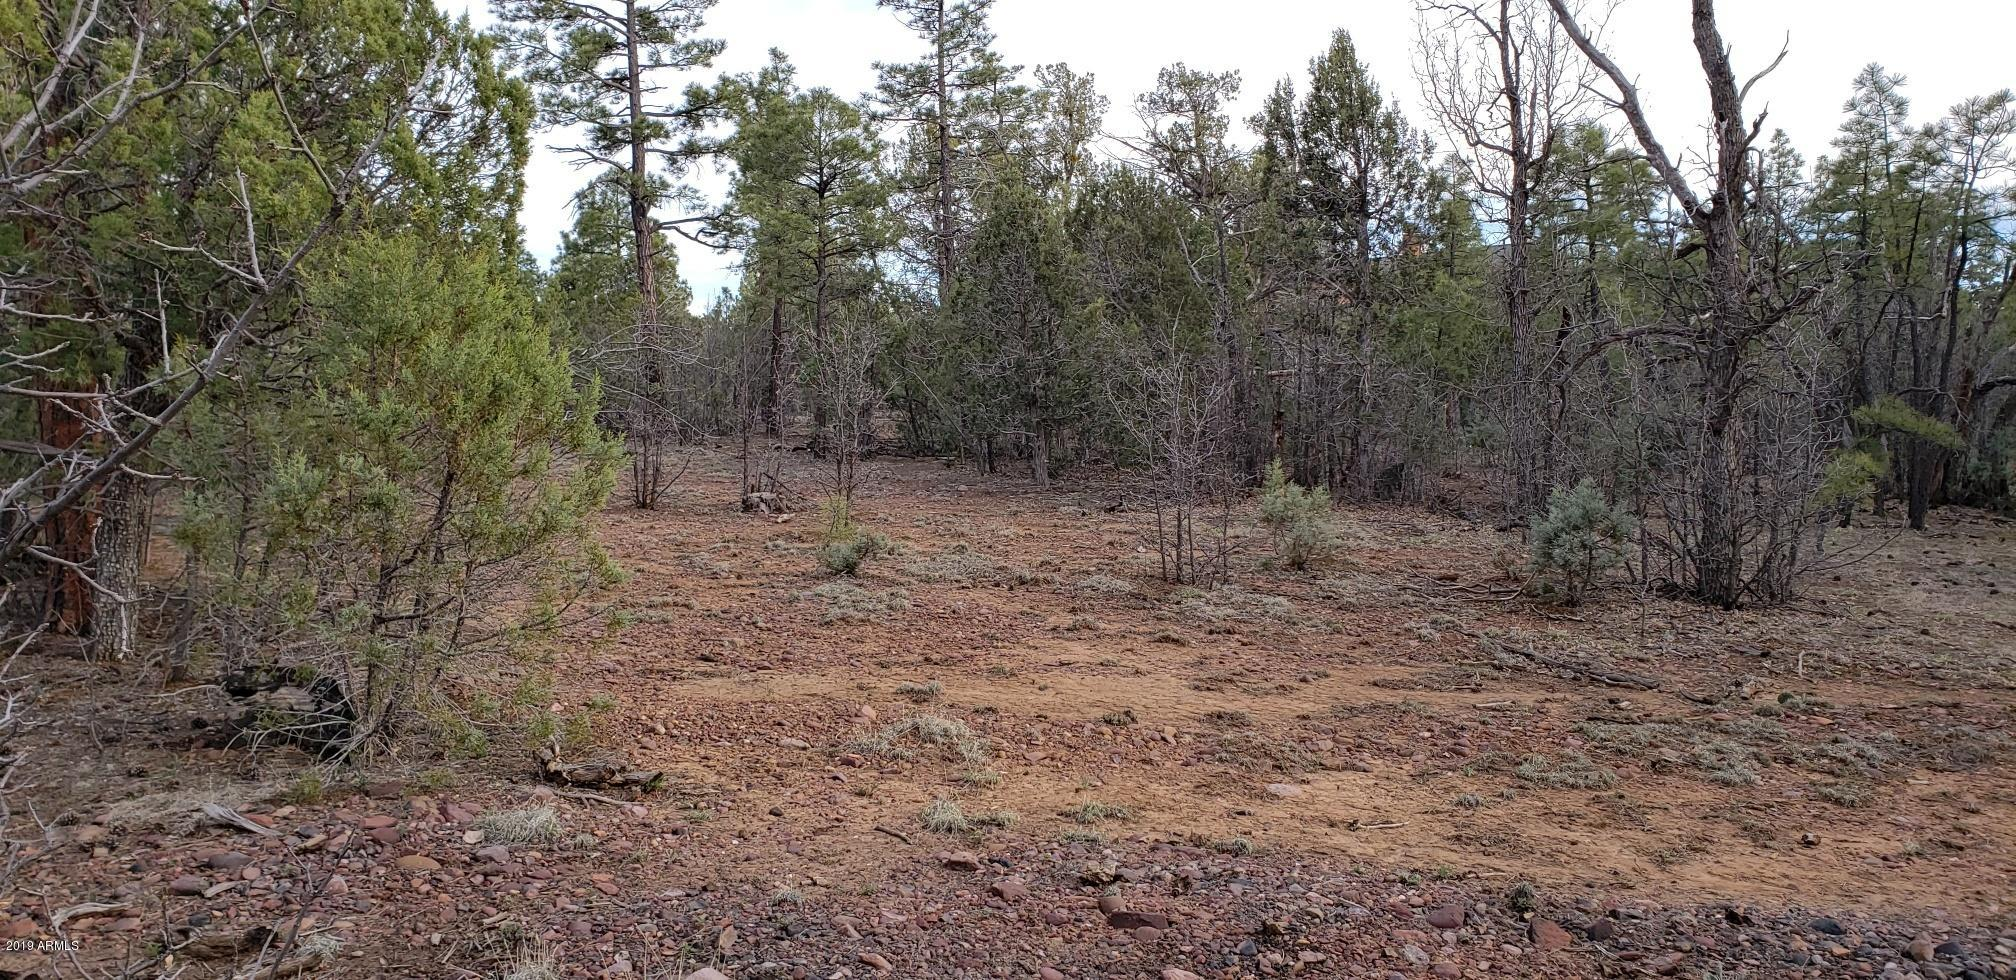 1580 S FALLING LEAF Road # 303, Show Low, Arizona 85901, ,Land,For Sale,1580 S FALLING LEAF Road # 303,5925120